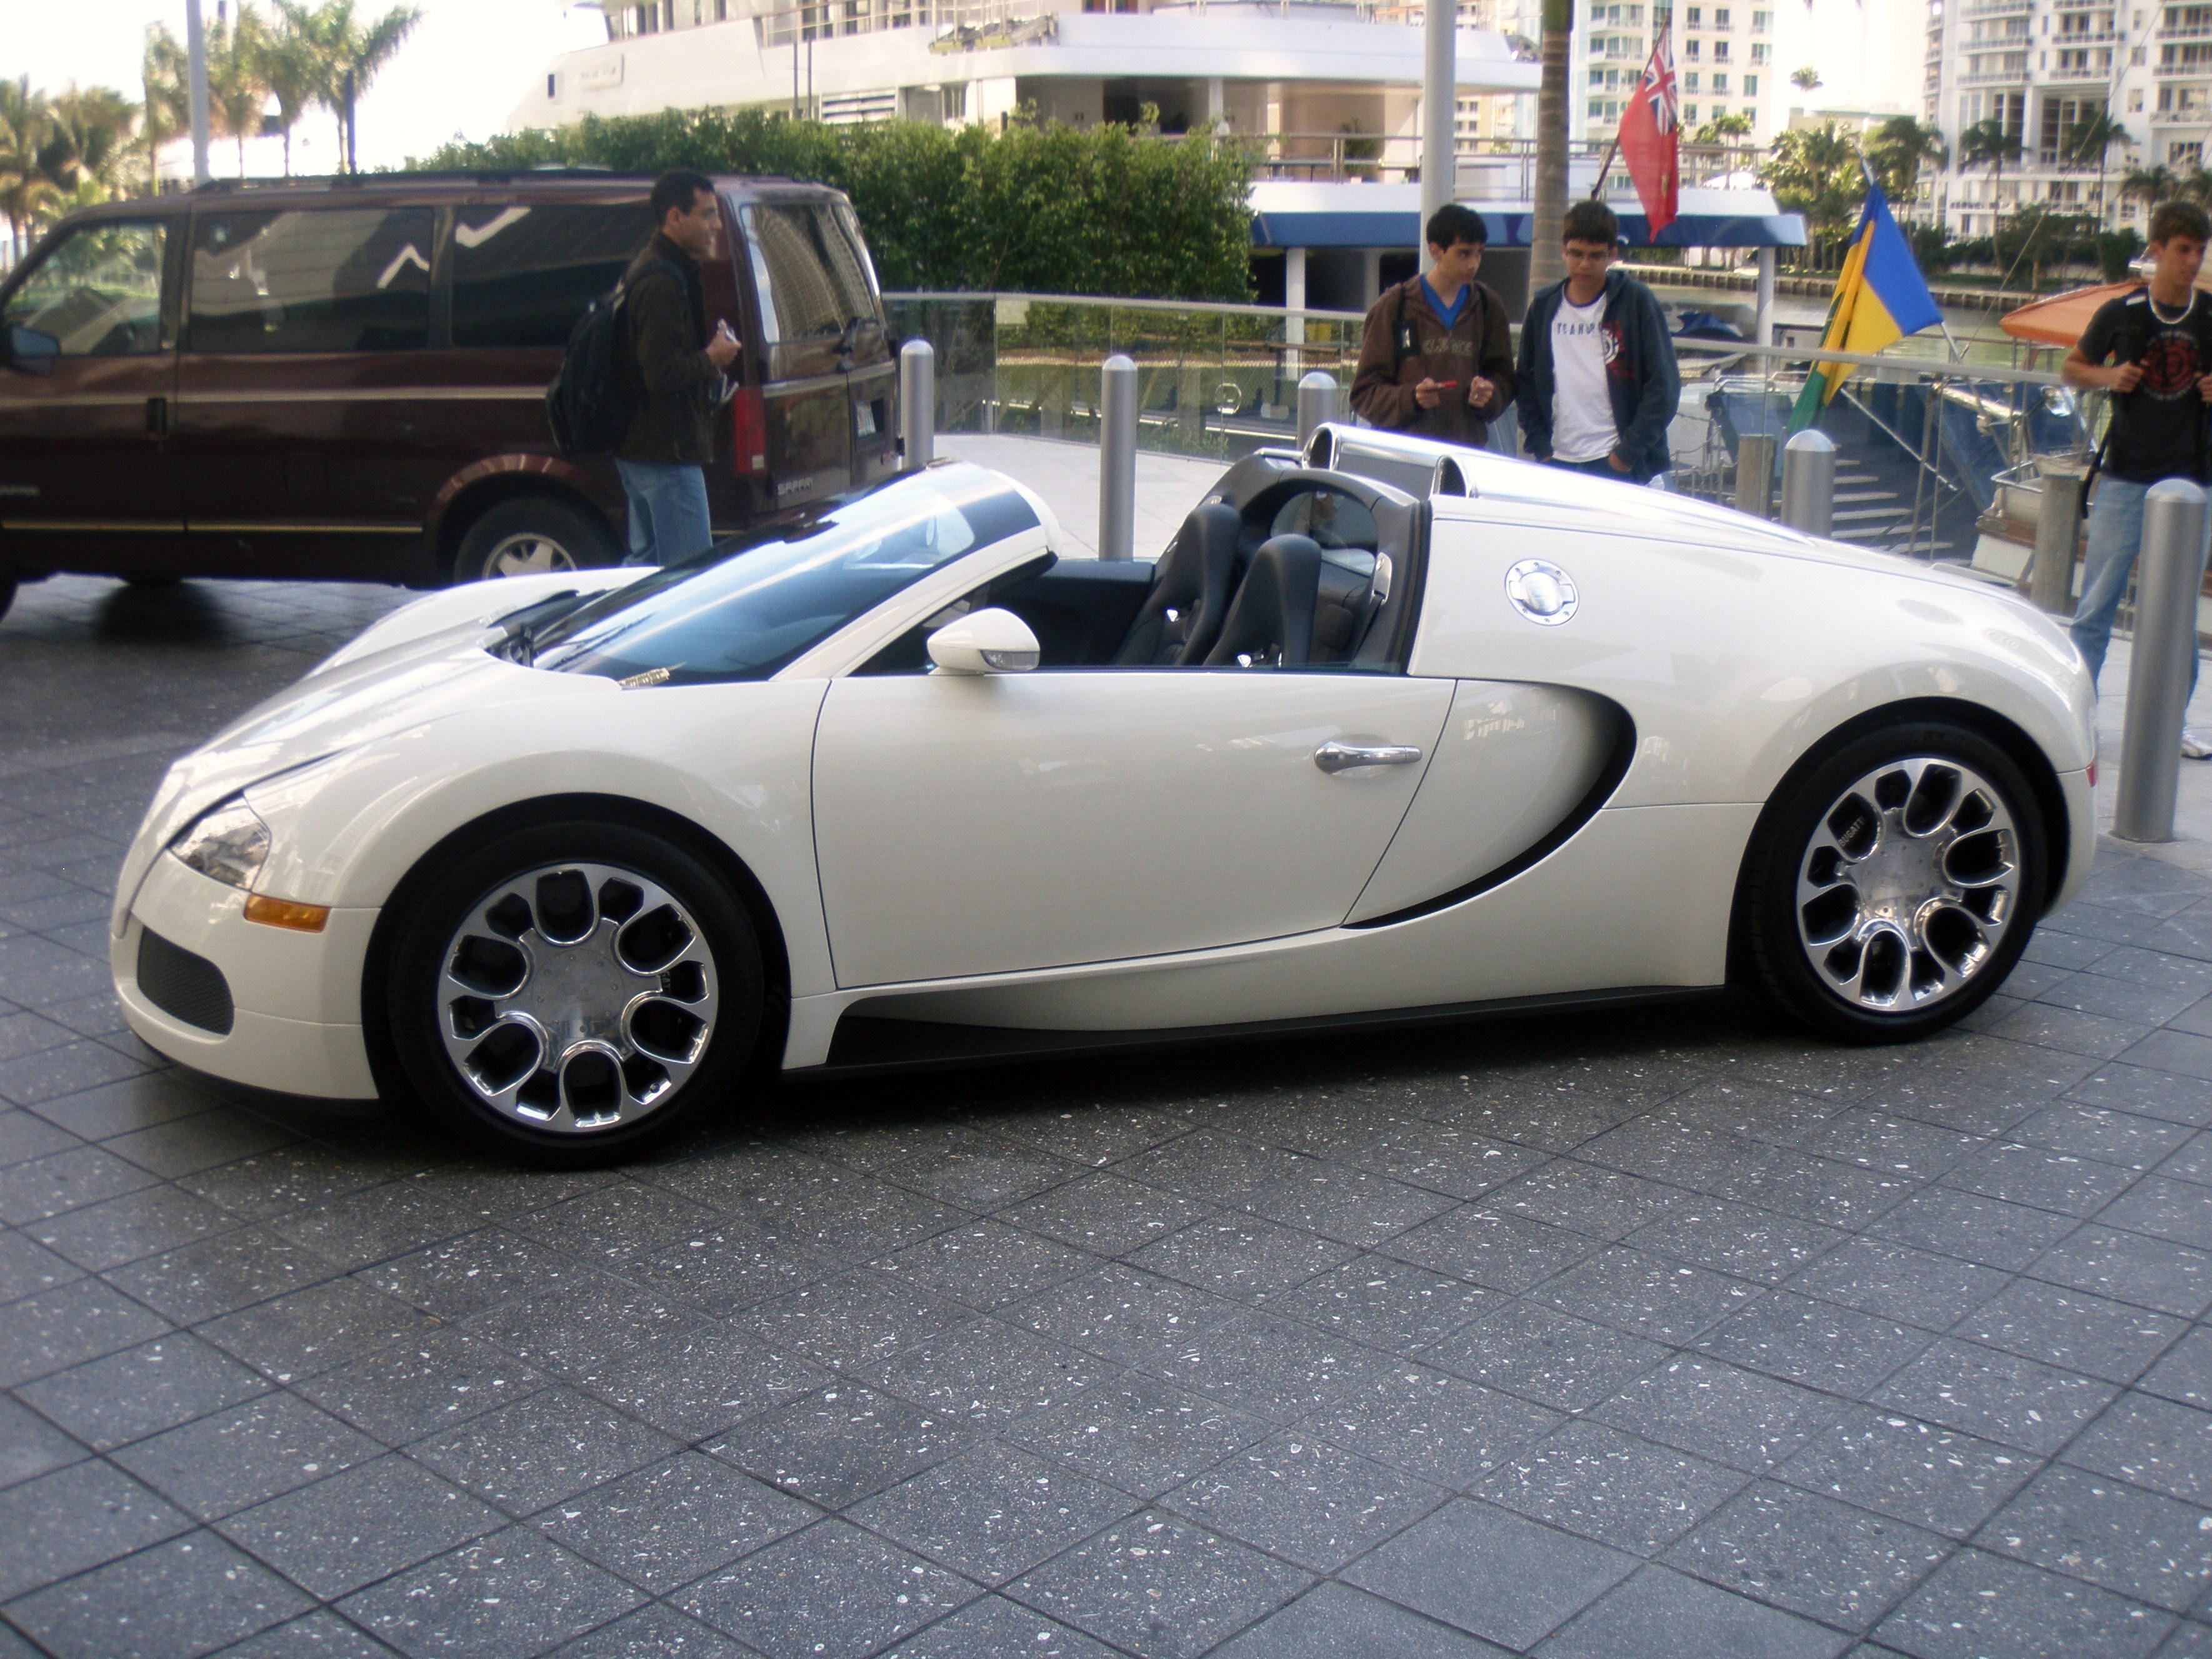 333_Bugatti_Veyron_Grand_Sport_EB_164 Amazing Bugatti Veyron Price In Australia Cars Trend